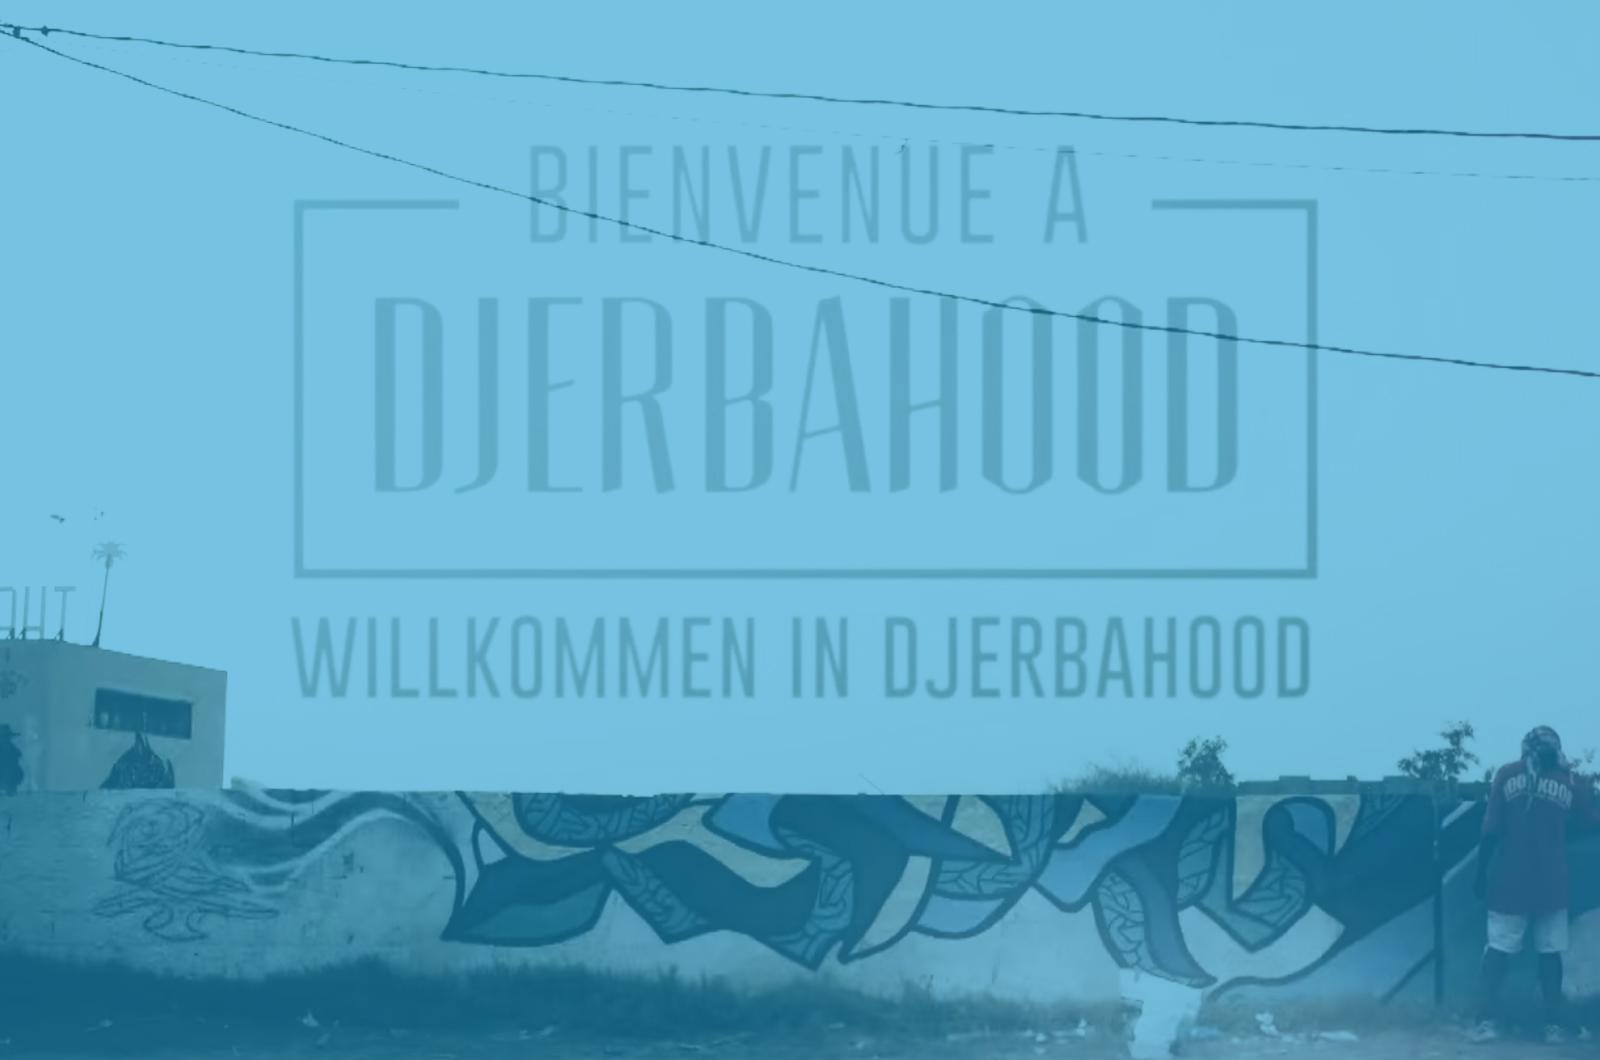 webserie-arte-djerbahood-blue